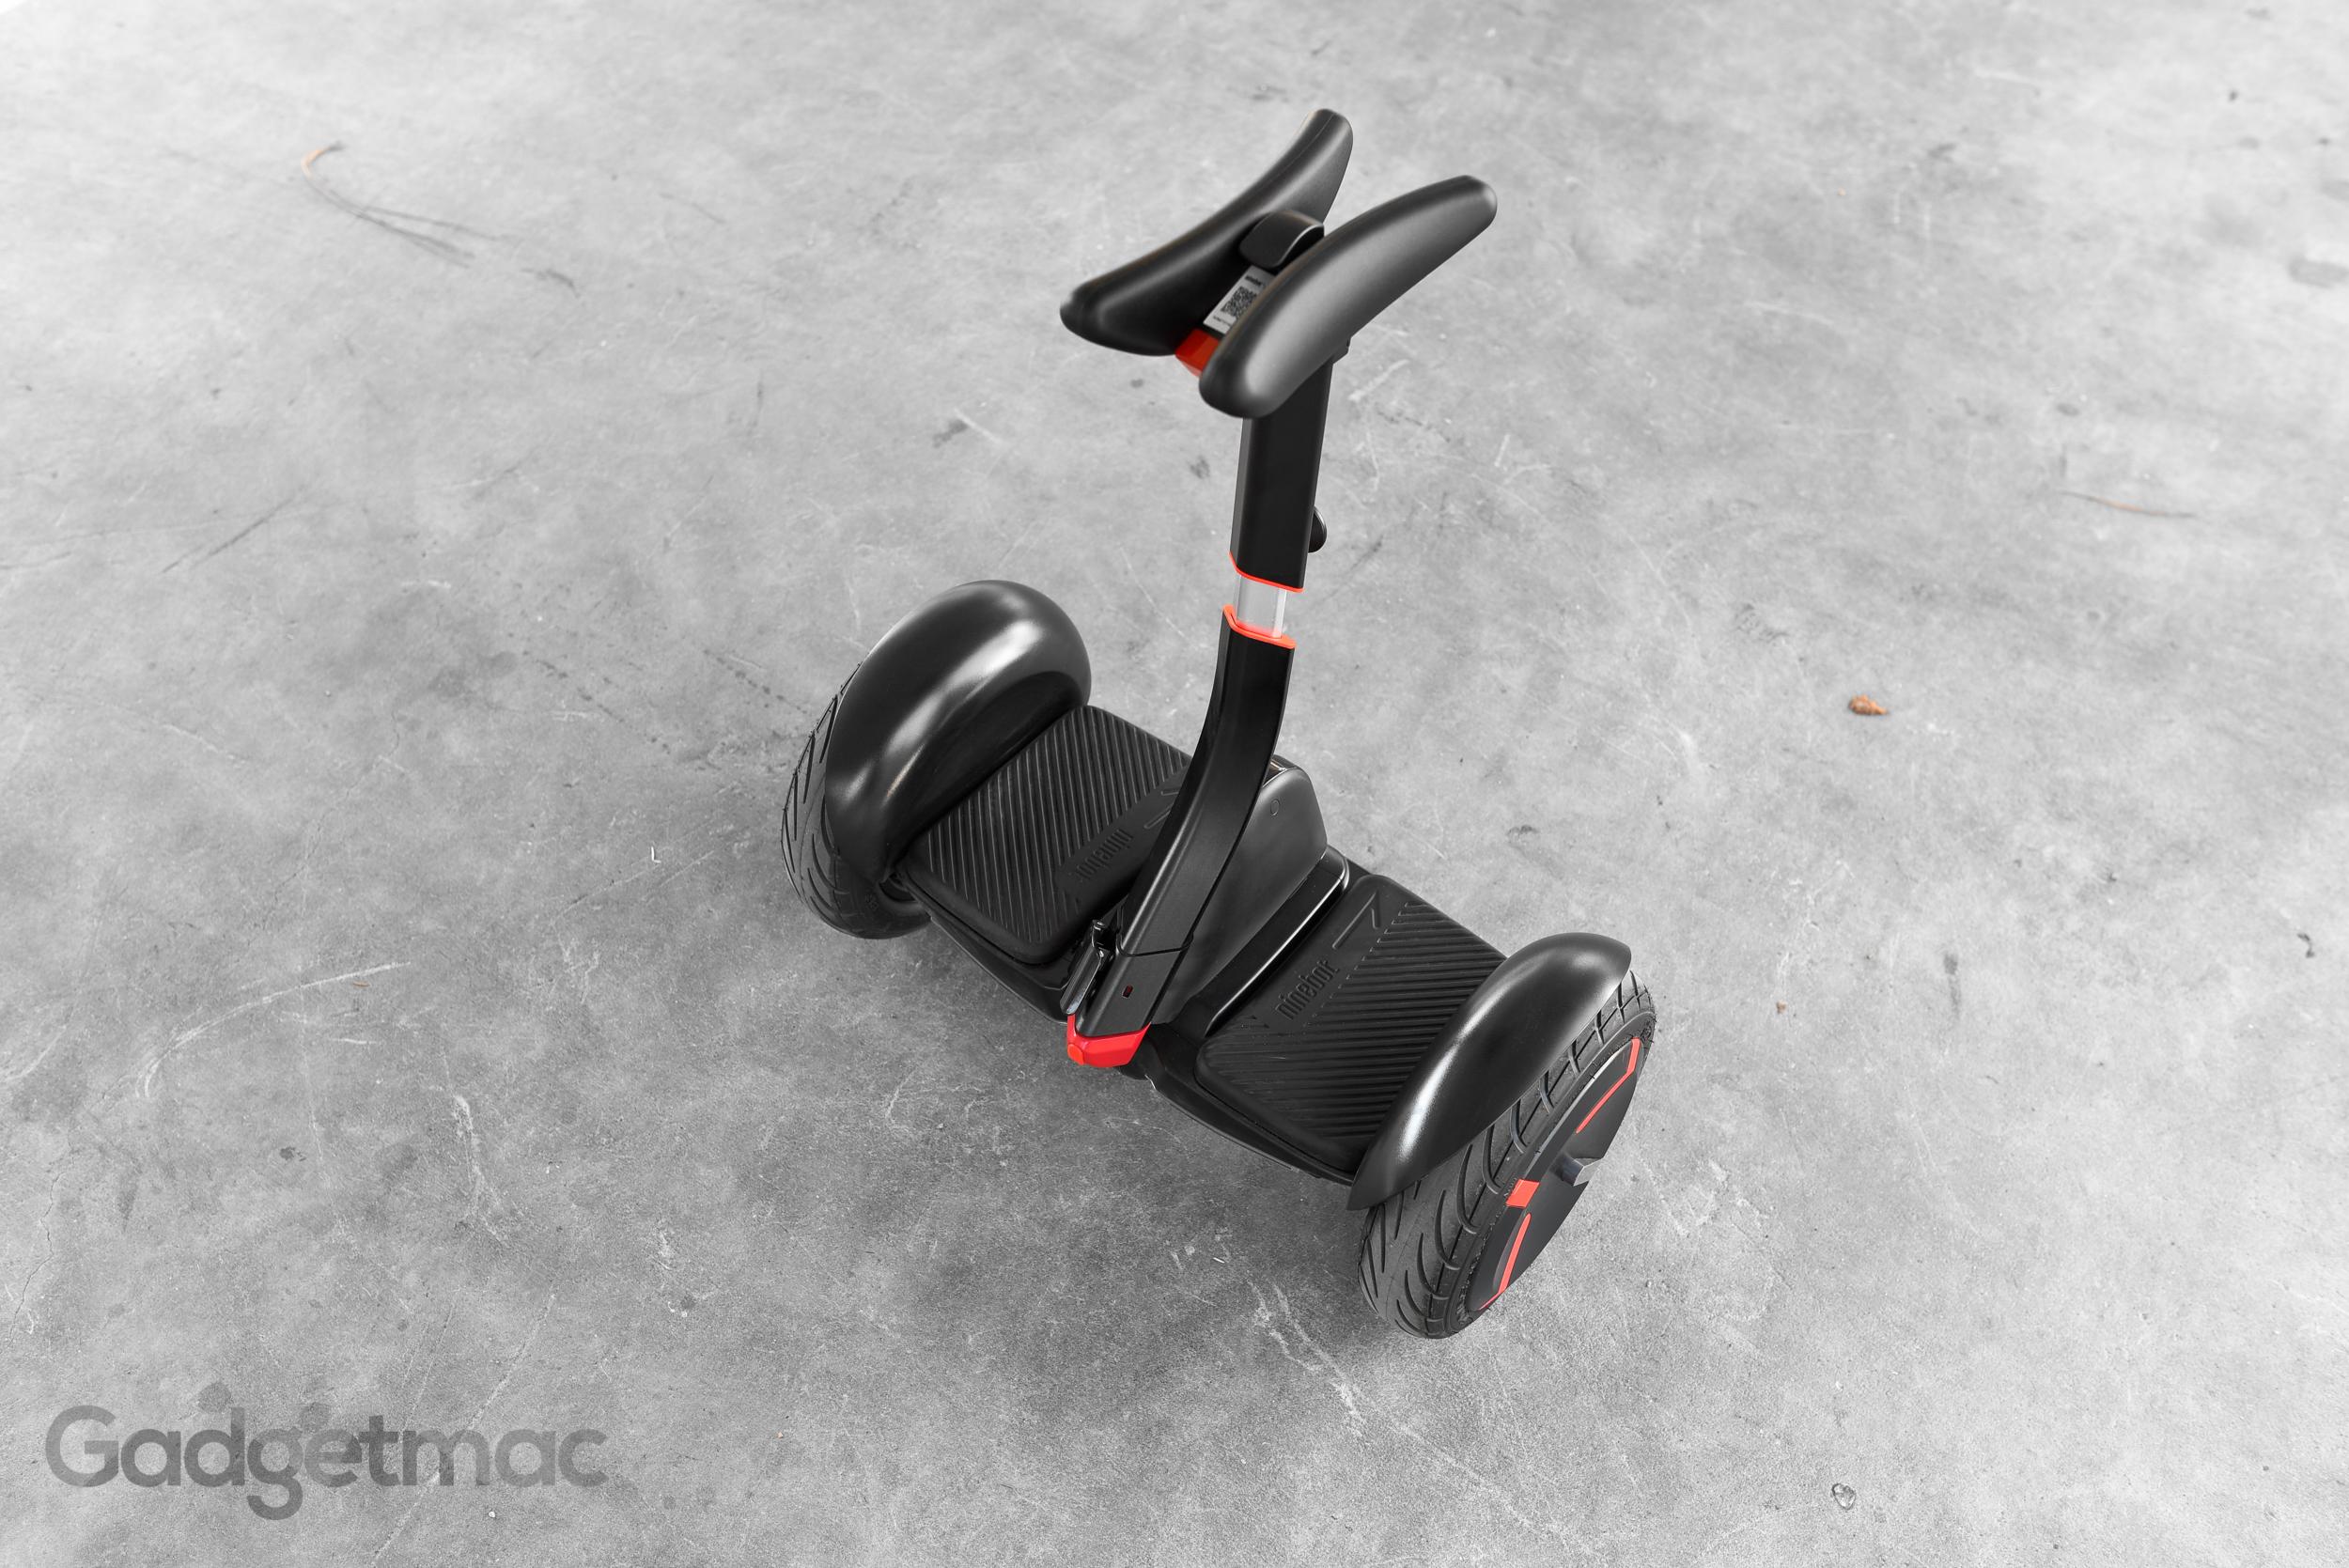 segway-minipro-hoverboard.jpg